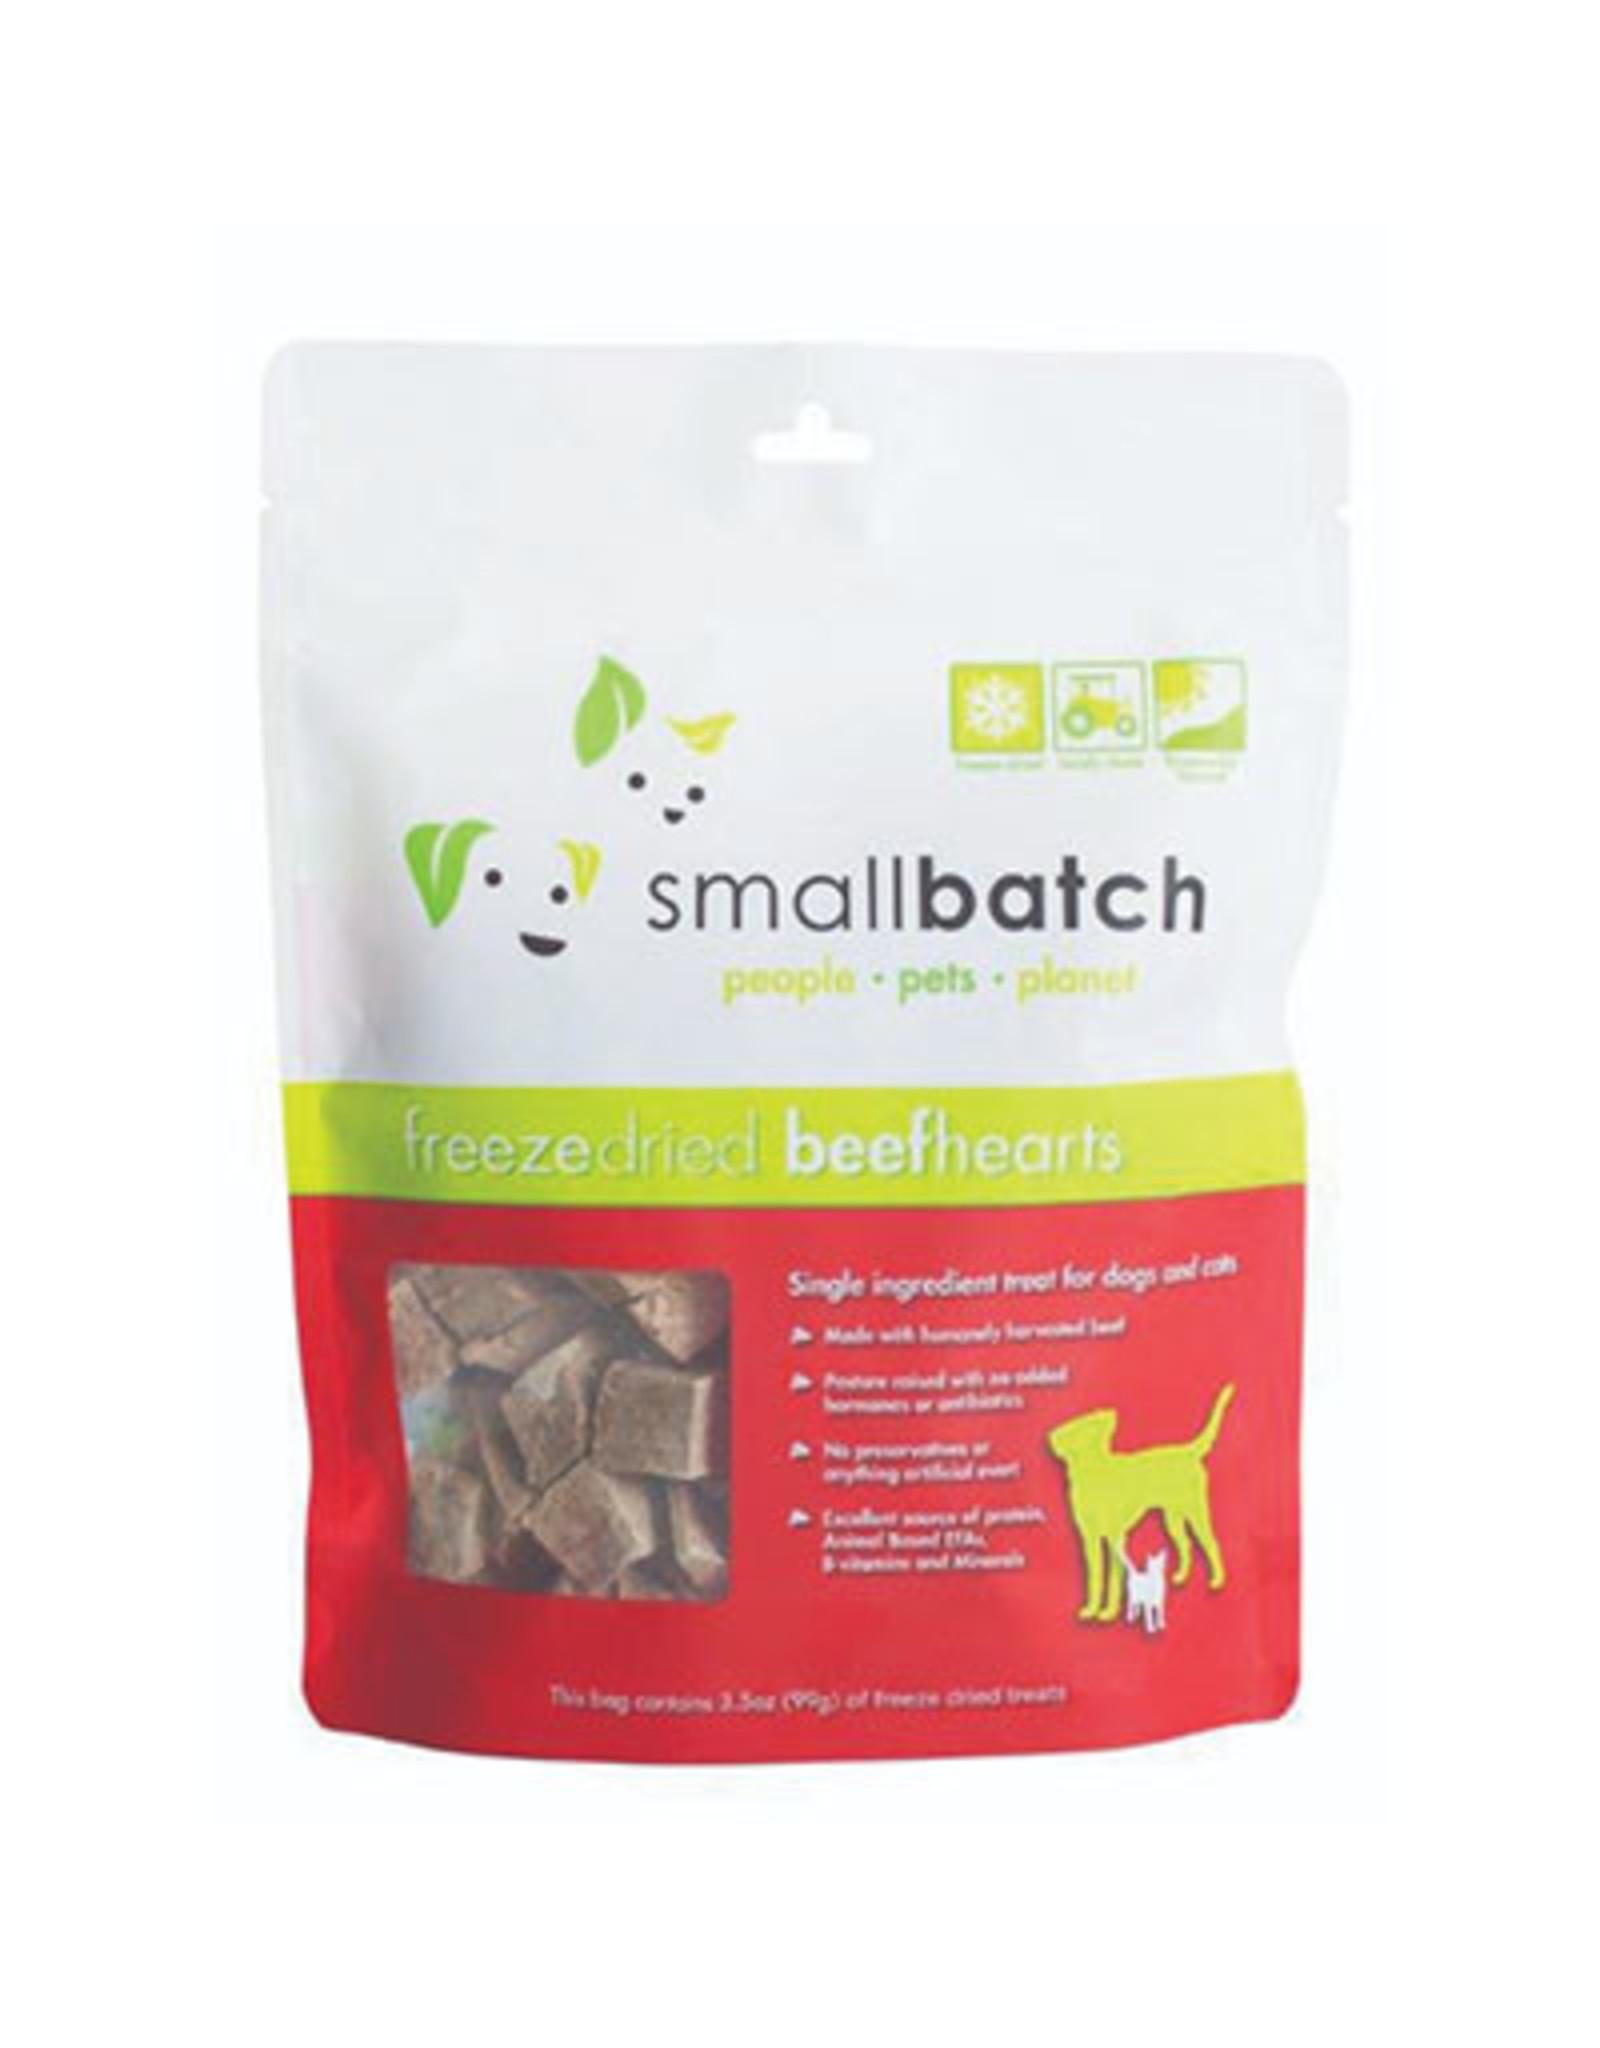 Smallbatch SMALLBATCH FREEZE DRIED BEEF HEARTS 3.5OZ